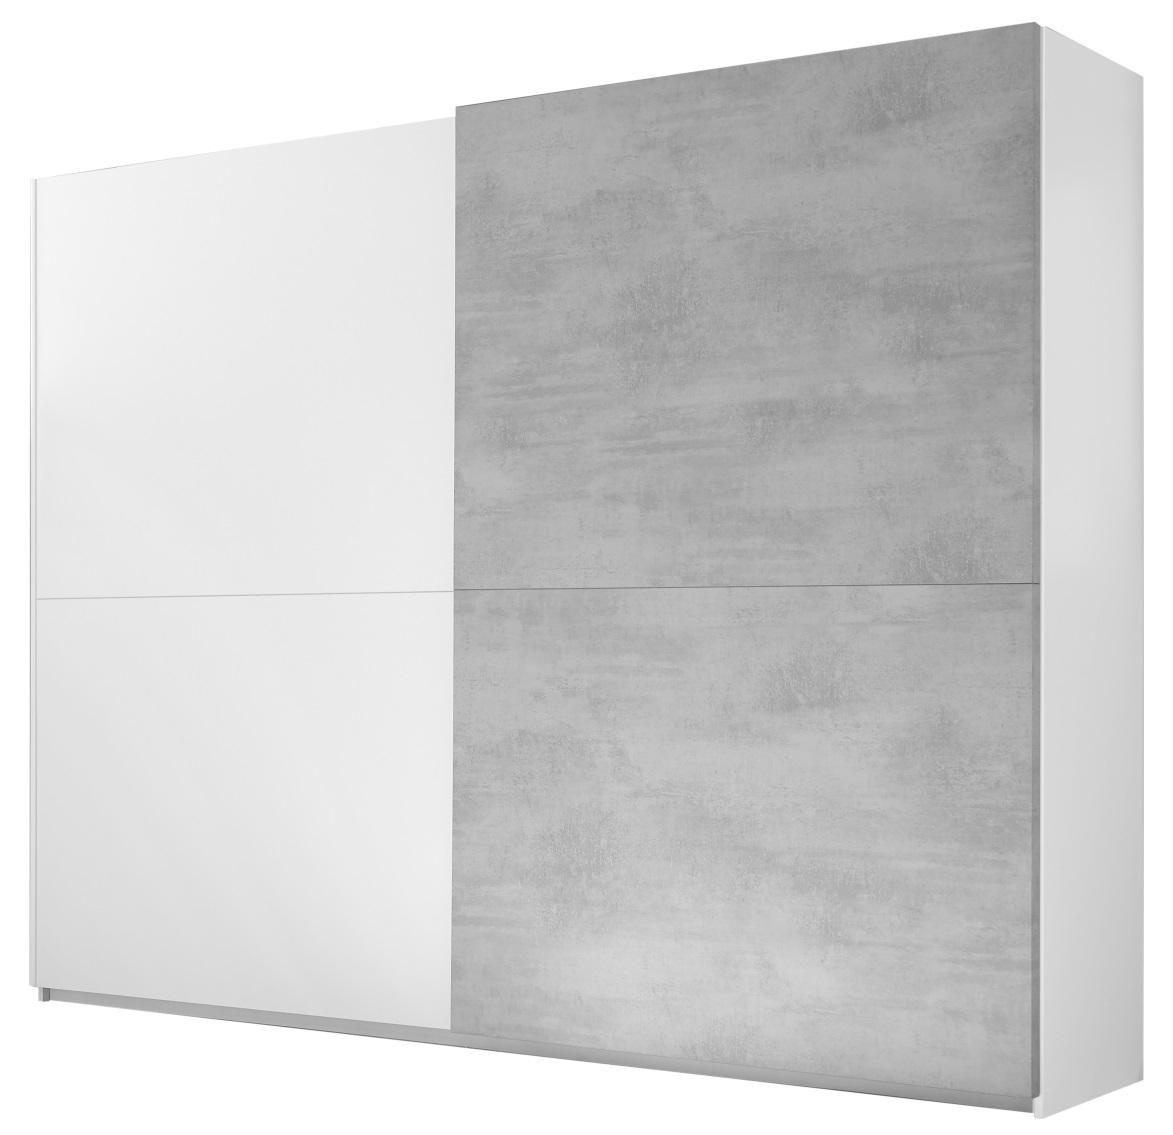 Kledingkast Amalti Full 220 cm breed in mat wit met grijs beton